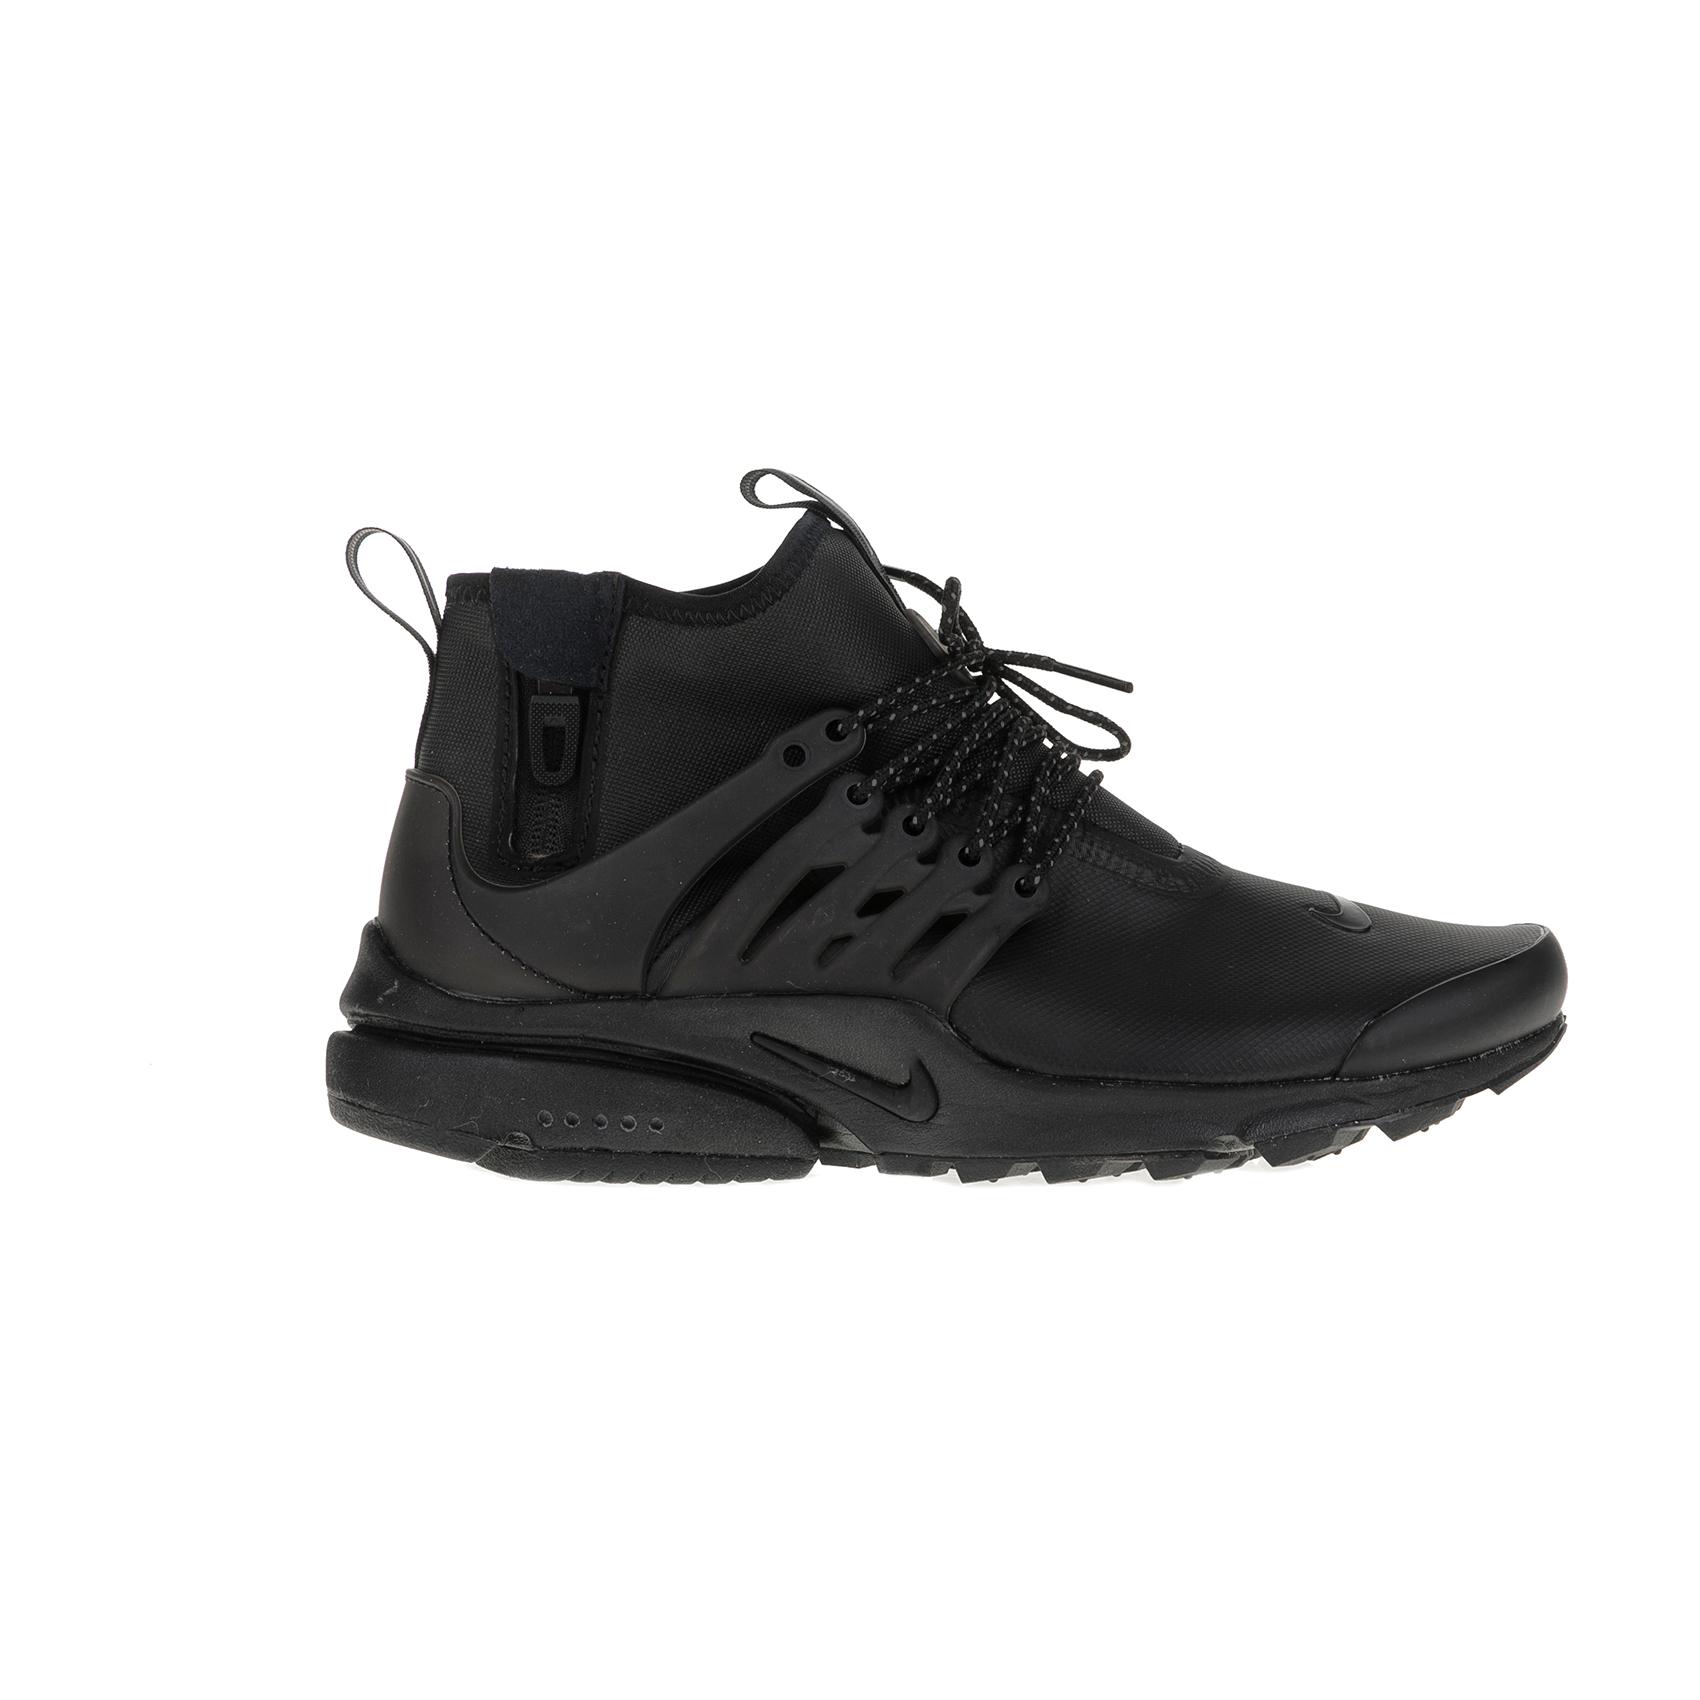 NIKE – Ανδρικά αθλητικά παπούτσια AIR PRESTO MID UTILITY μαύρα